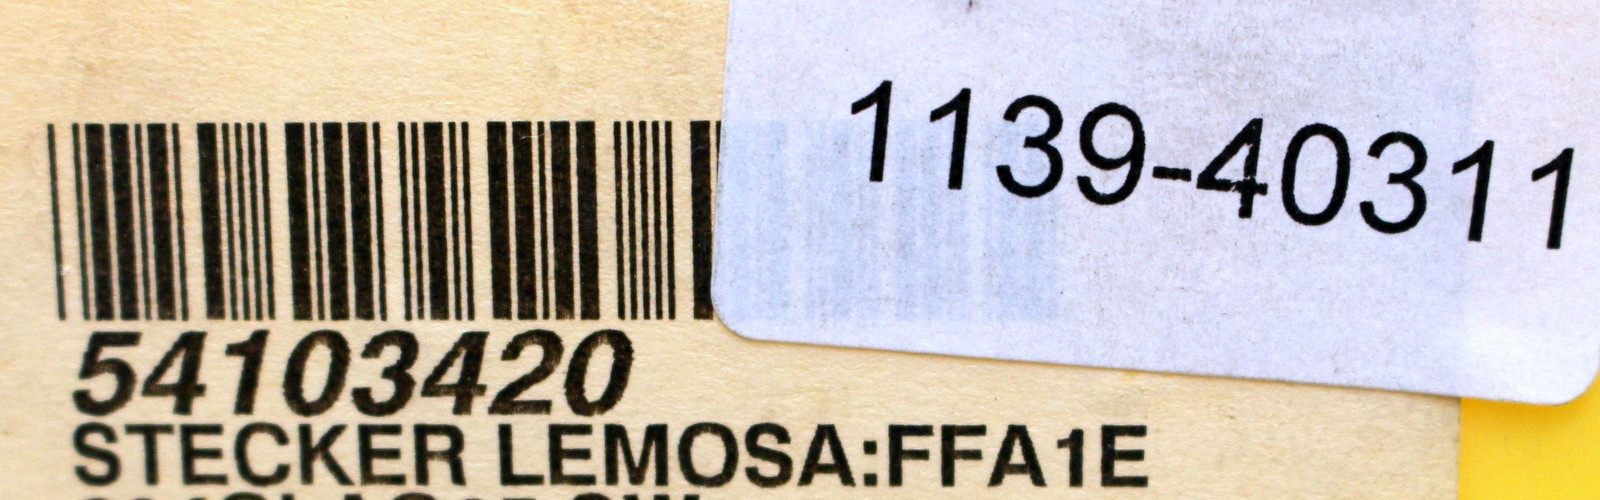 LEMO Stecker LEMO Connector FFA.1E.304.CLAC65 SW 1 Stück